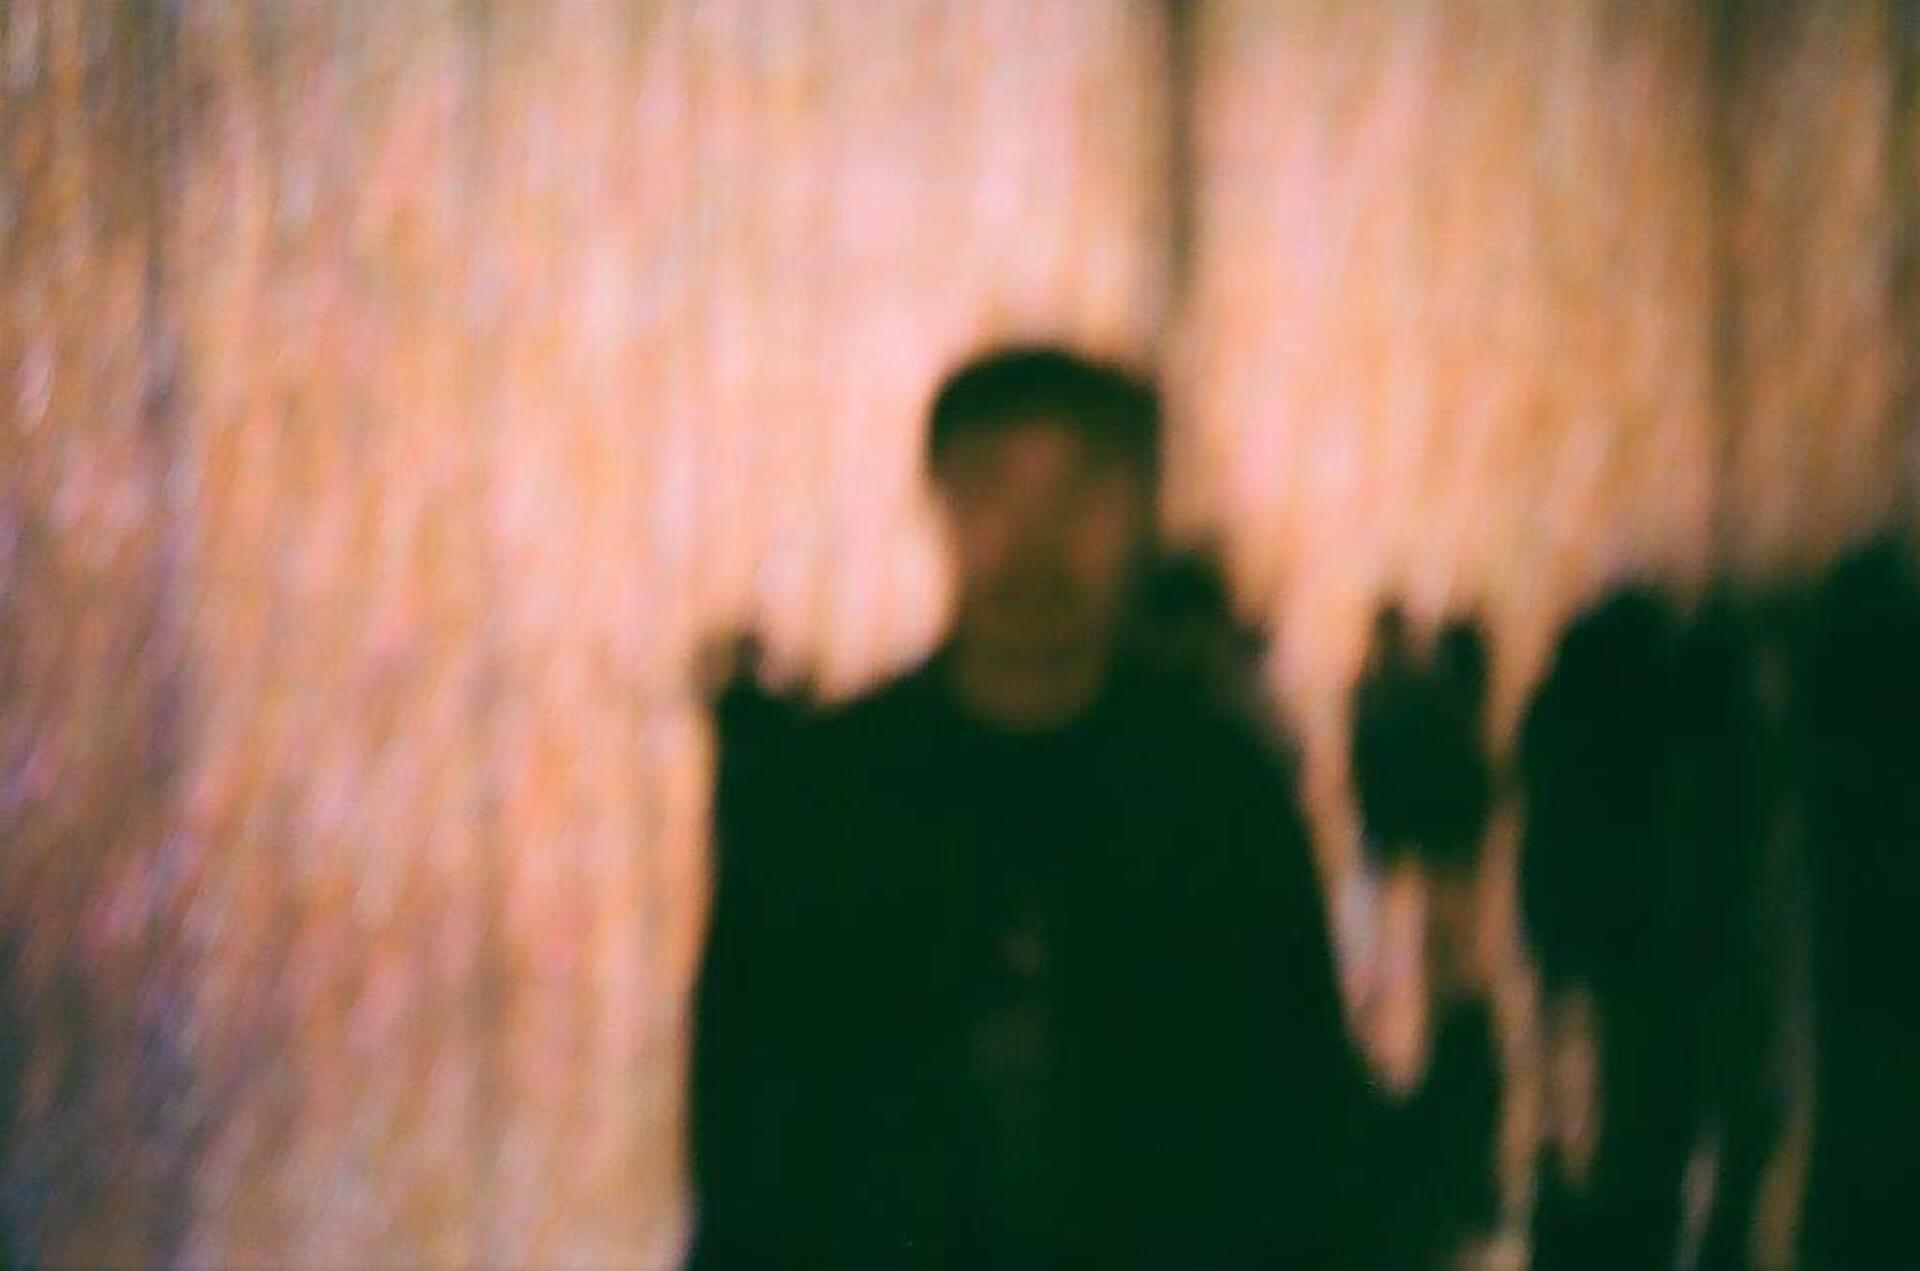 LIQUIDROOM15周年公演にnever young beach×七尾旅人、クラムボン『JP』完全再現、追加でCompuma、Licaxxxらが発表 music190626-liquidroom15th-2-2.jpg